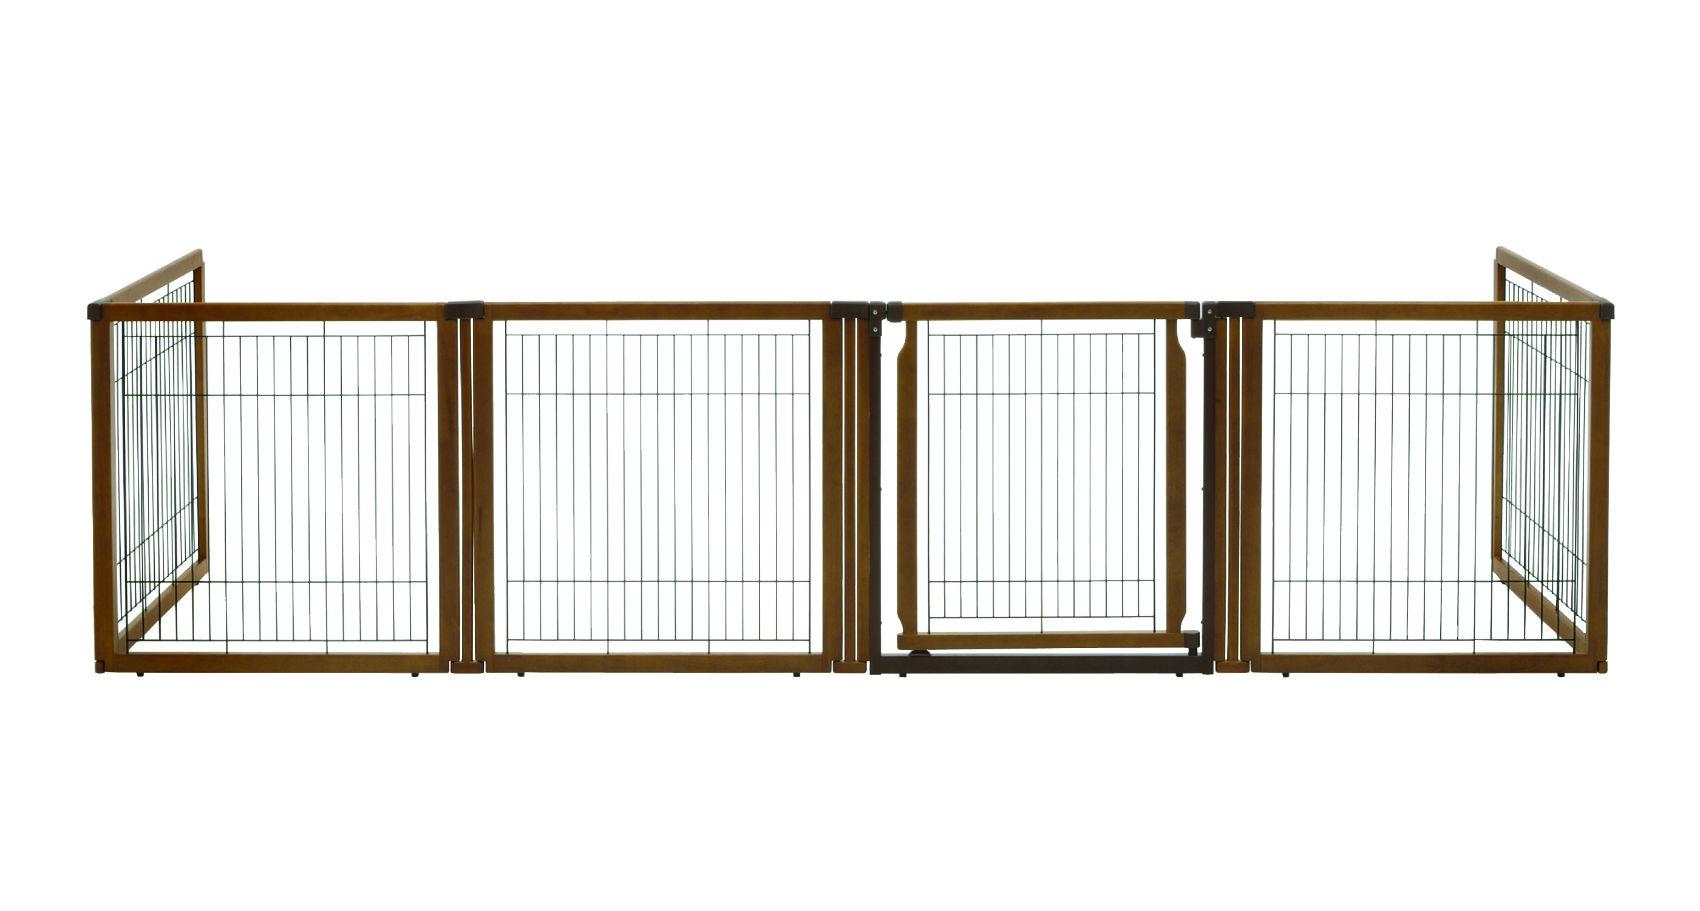 94171_1700_6-Panel_Freestanding